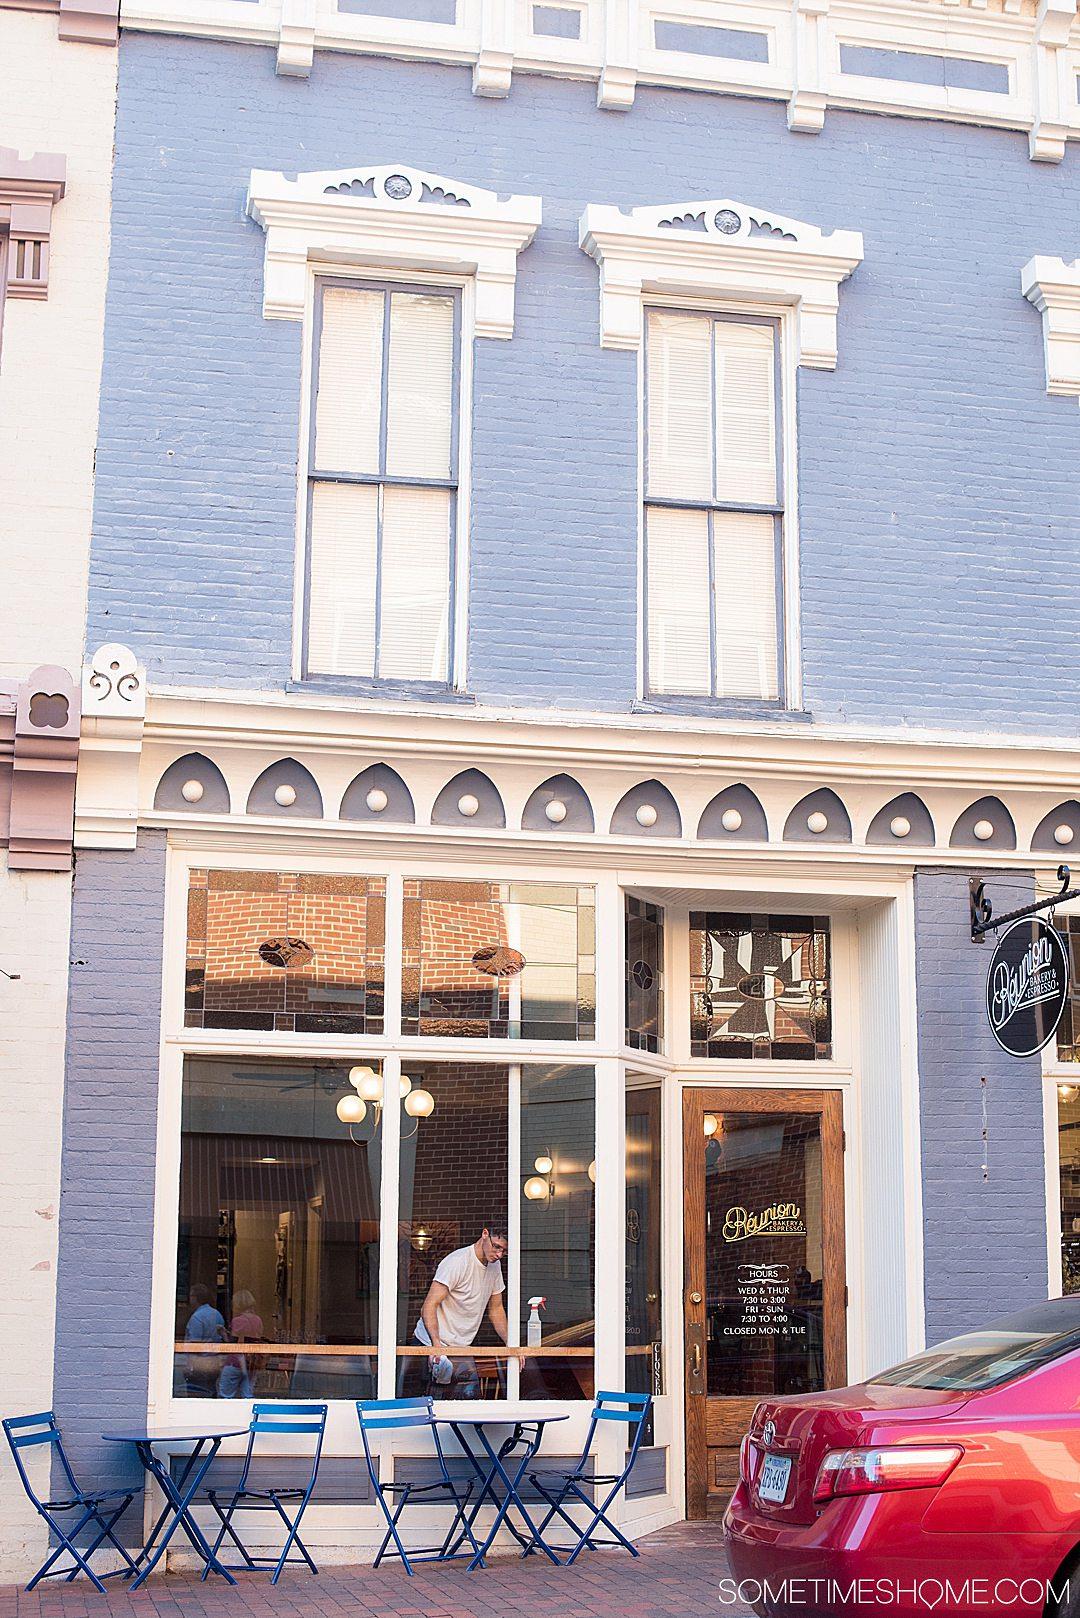 Suntrust Building in historic downtown Staunton, Virginia.